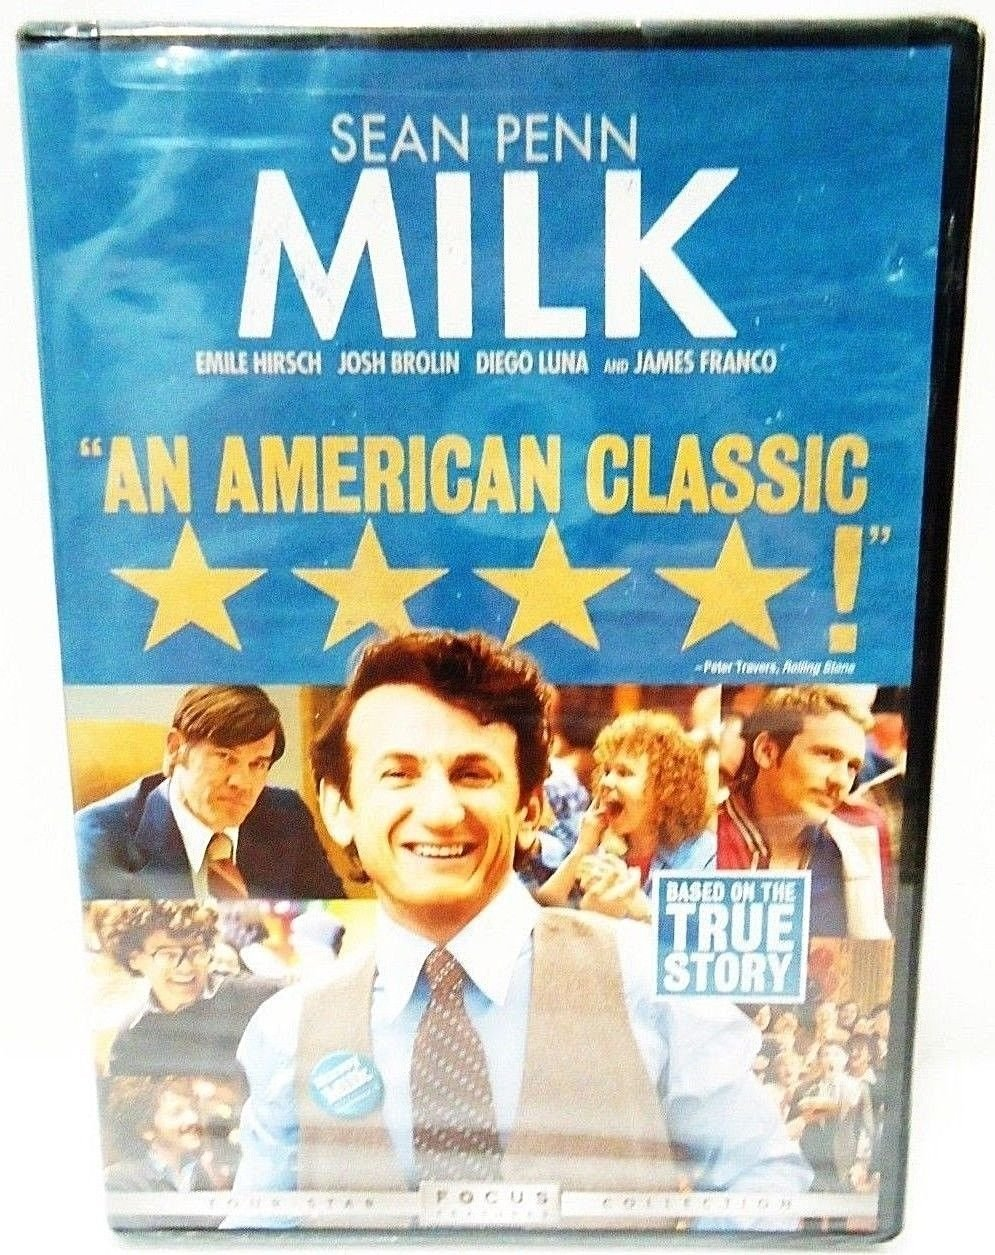 MILK - DVD - SEAN PENN - JAMES FRANCO - BRAND NEW - SEALED - HARVEY MILK - MOVIE